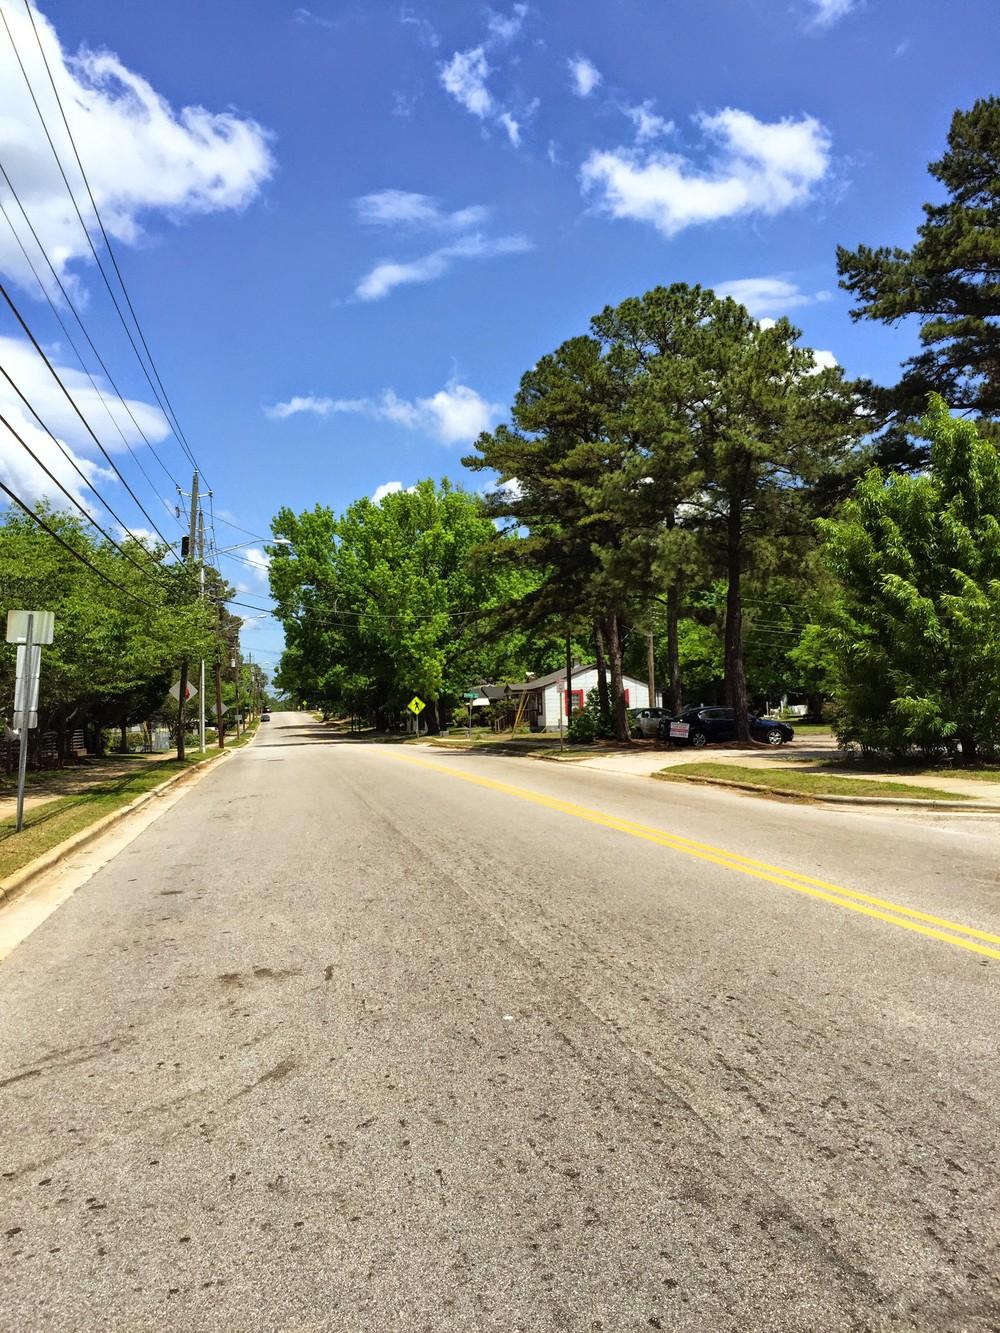 Method Road